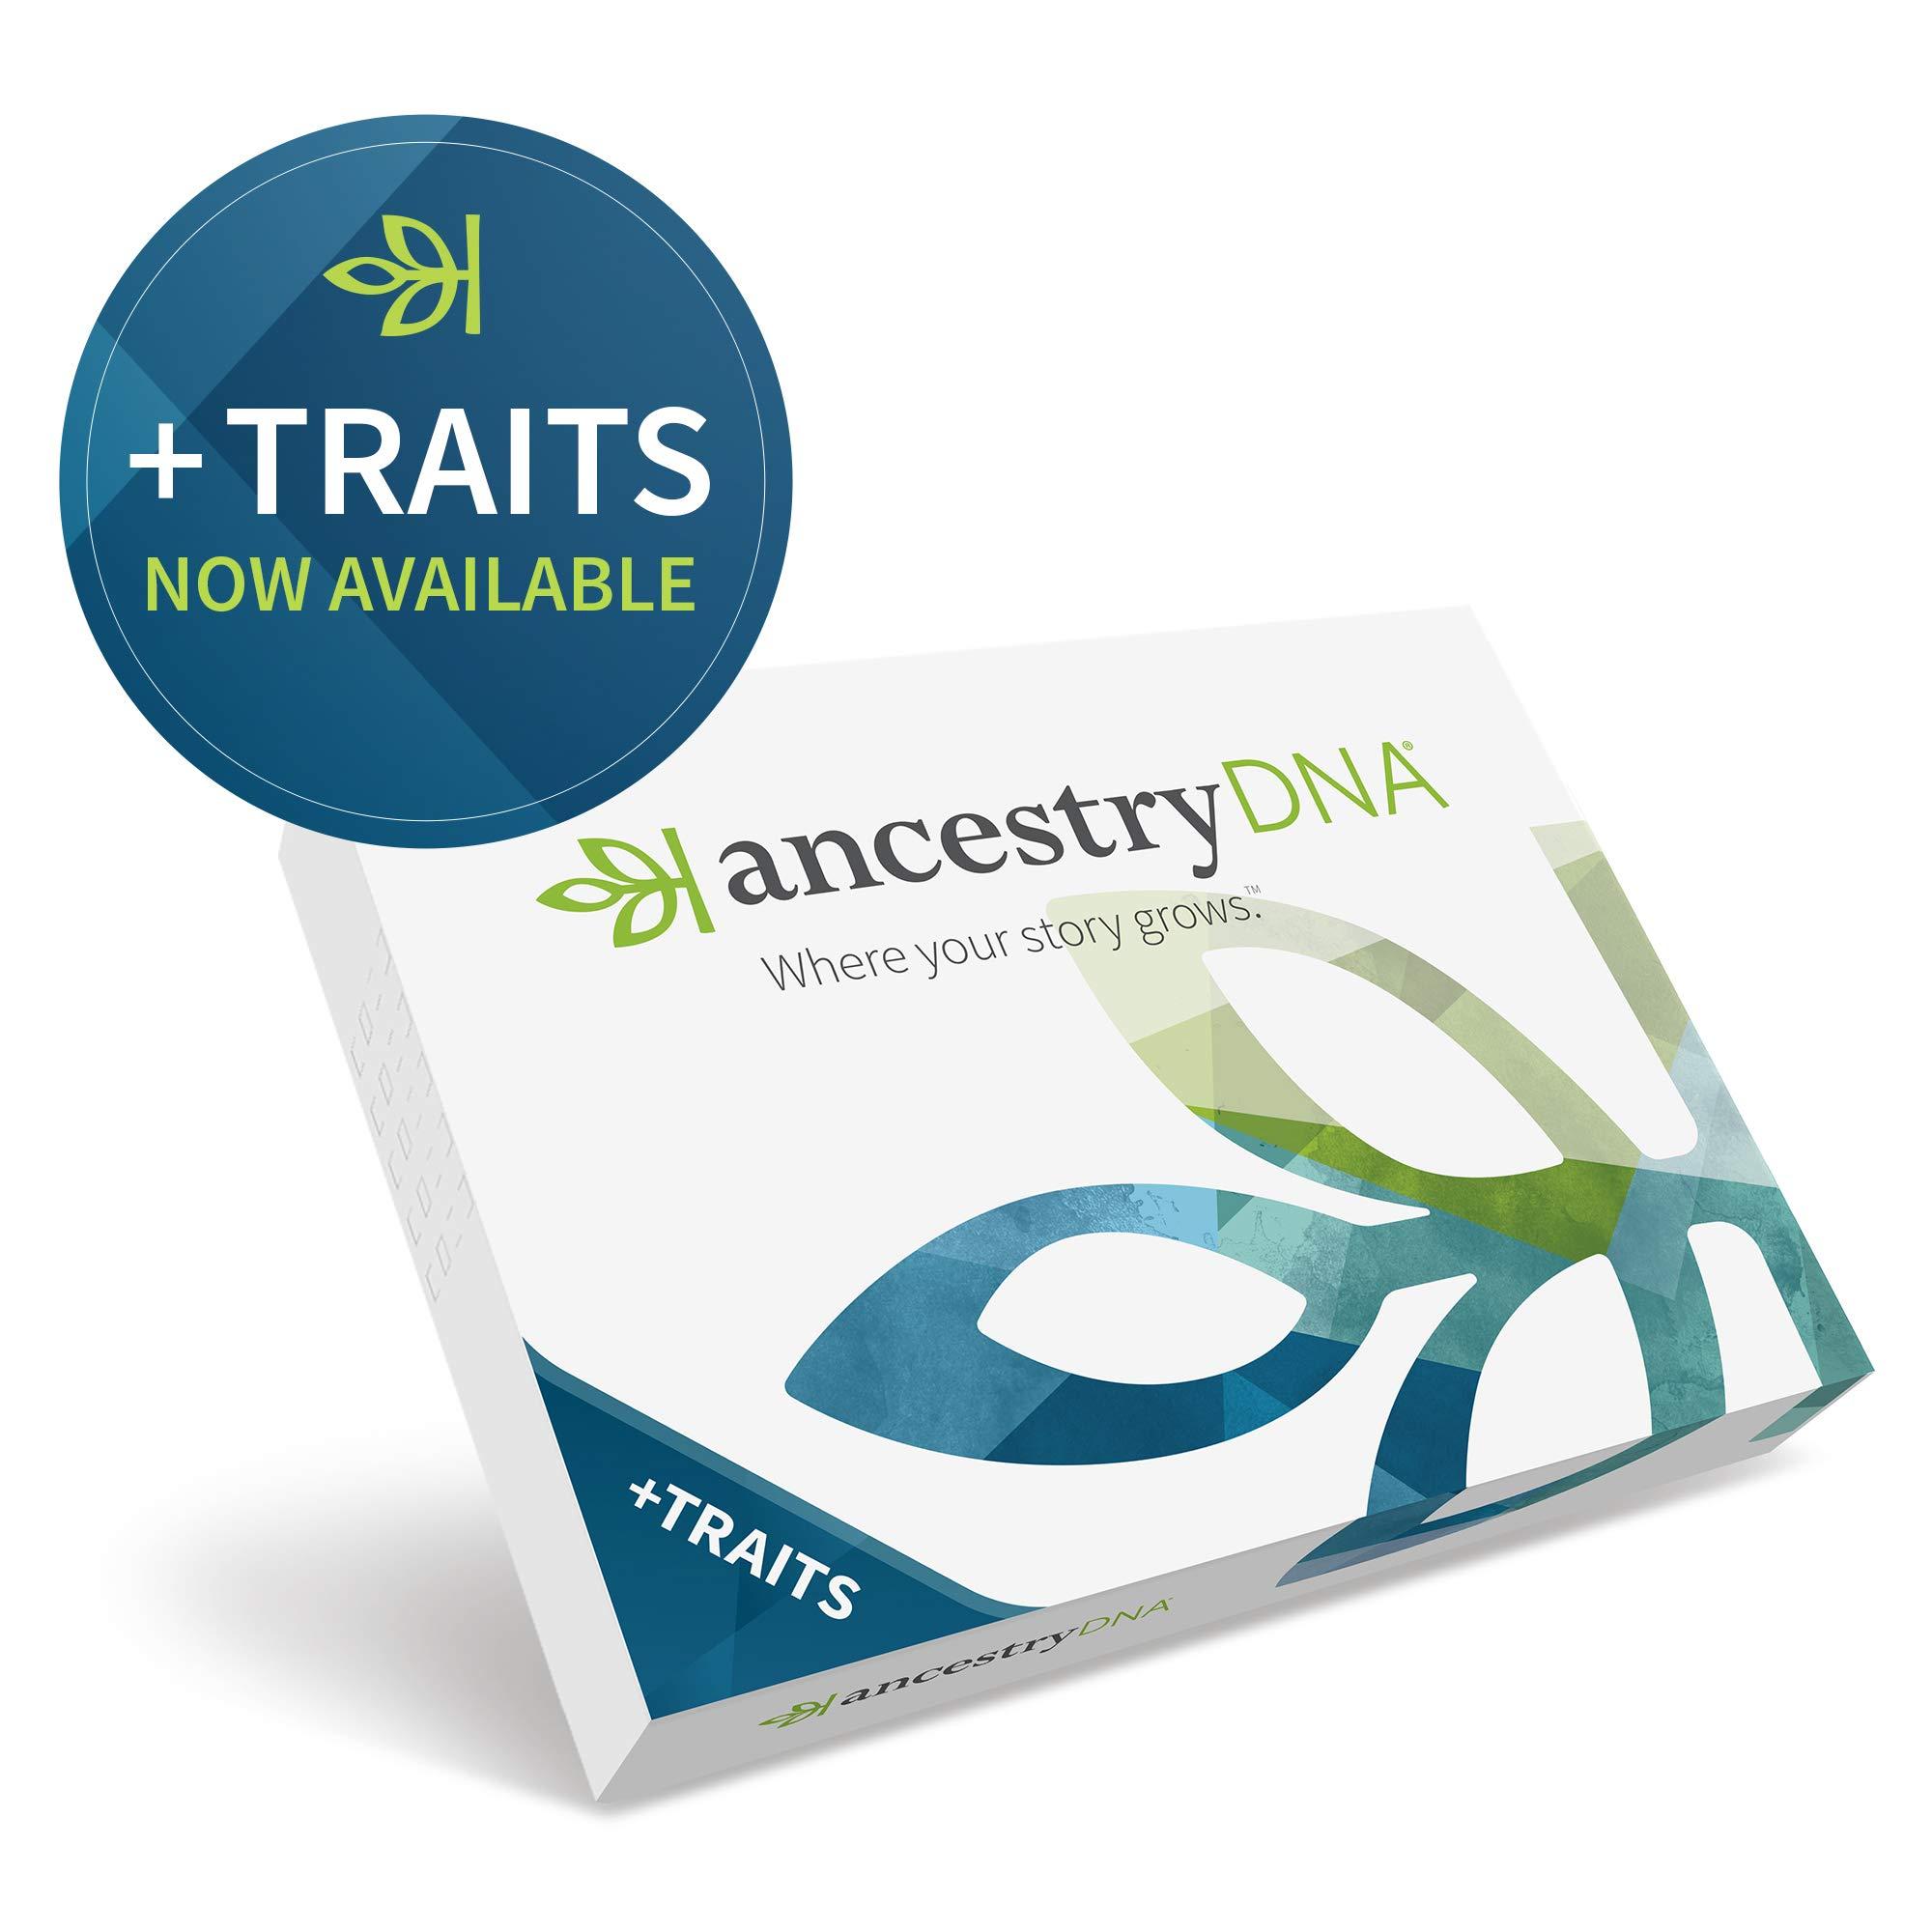 AncestryDNA: Genetic Ethnicity + Traits Test by AncestryDNA